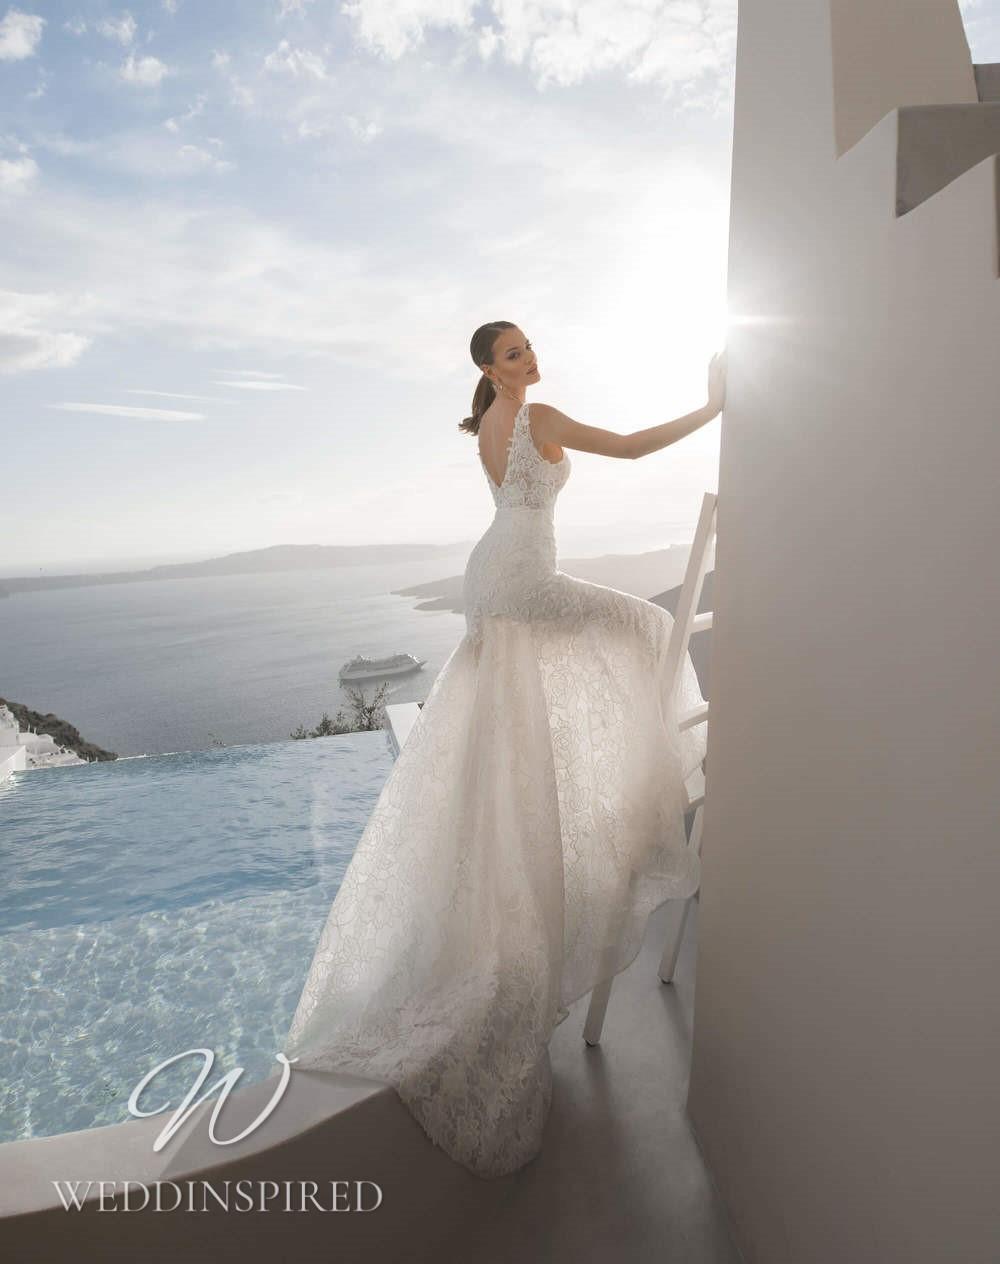 A Blunny 2021 lace A-line wedding dress